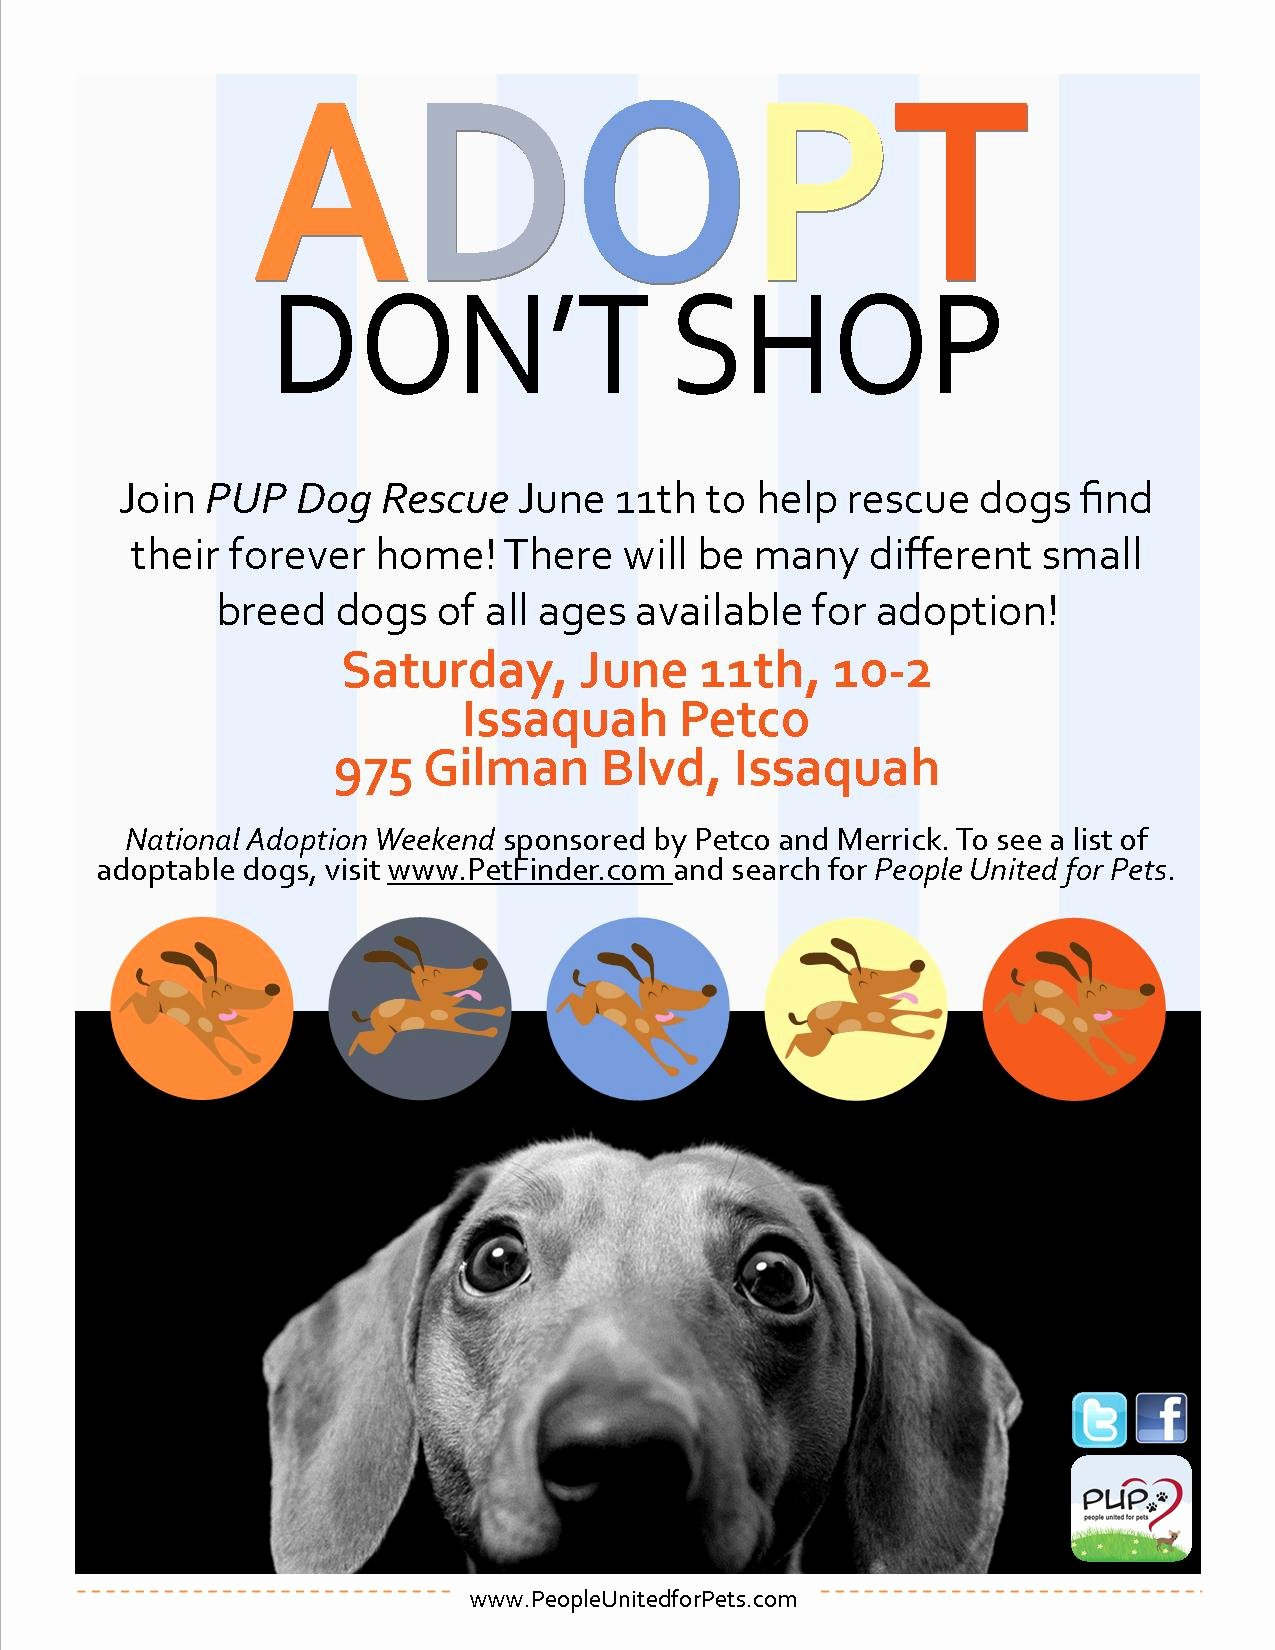 Pup Dog Rescue Flyers – Portfolio Michelle Fears